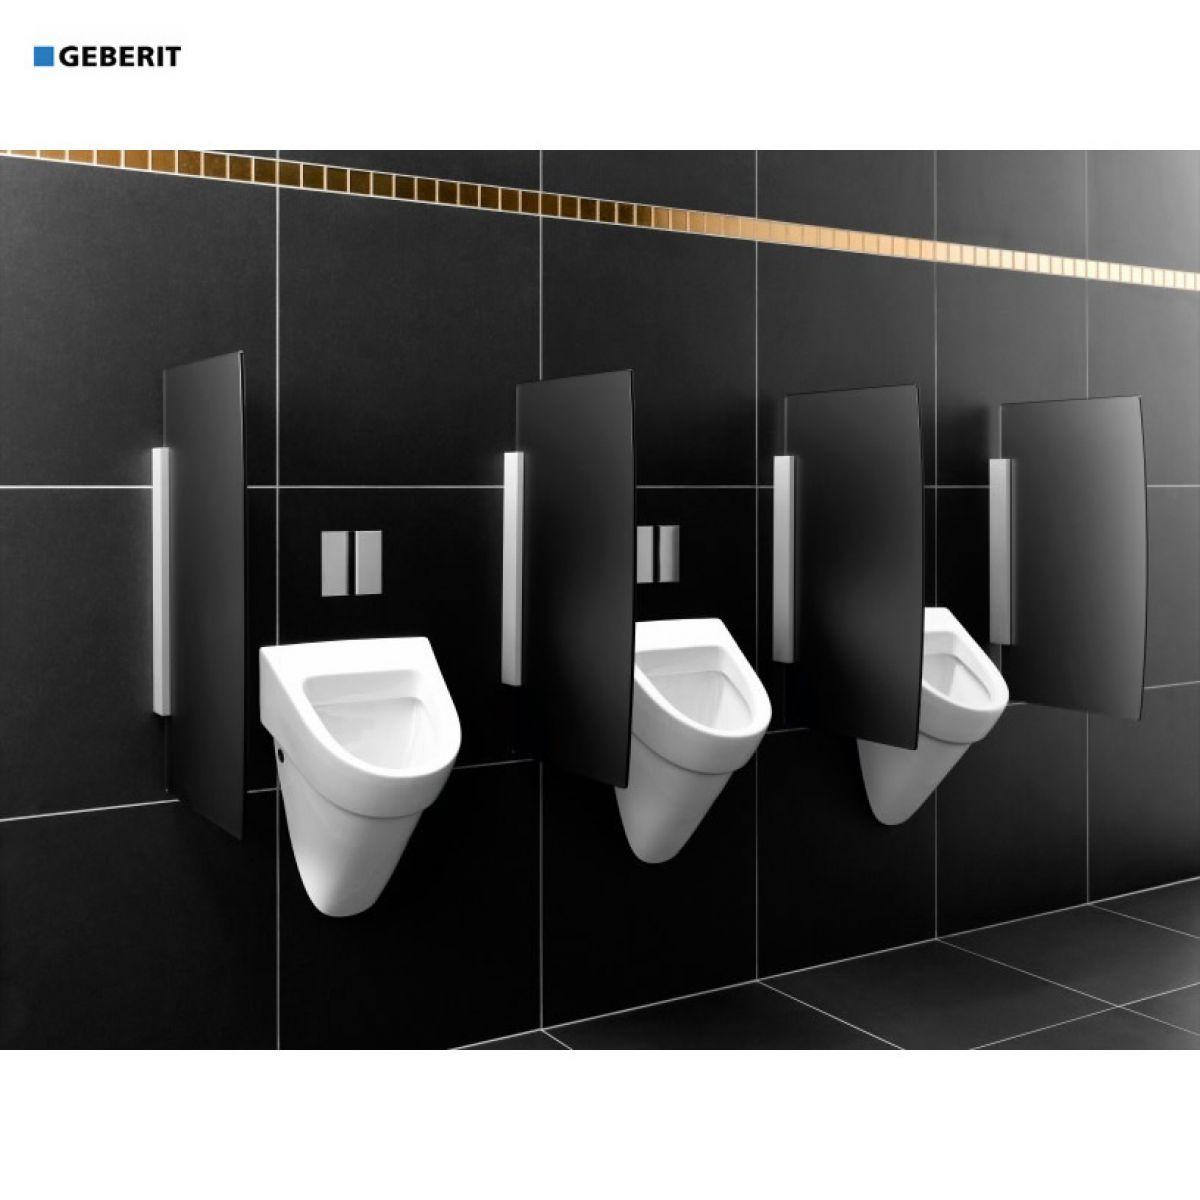 geberit duofix urinal division uk bathrooms. Black Bedroom Furniture Sets. Home Design Ideas